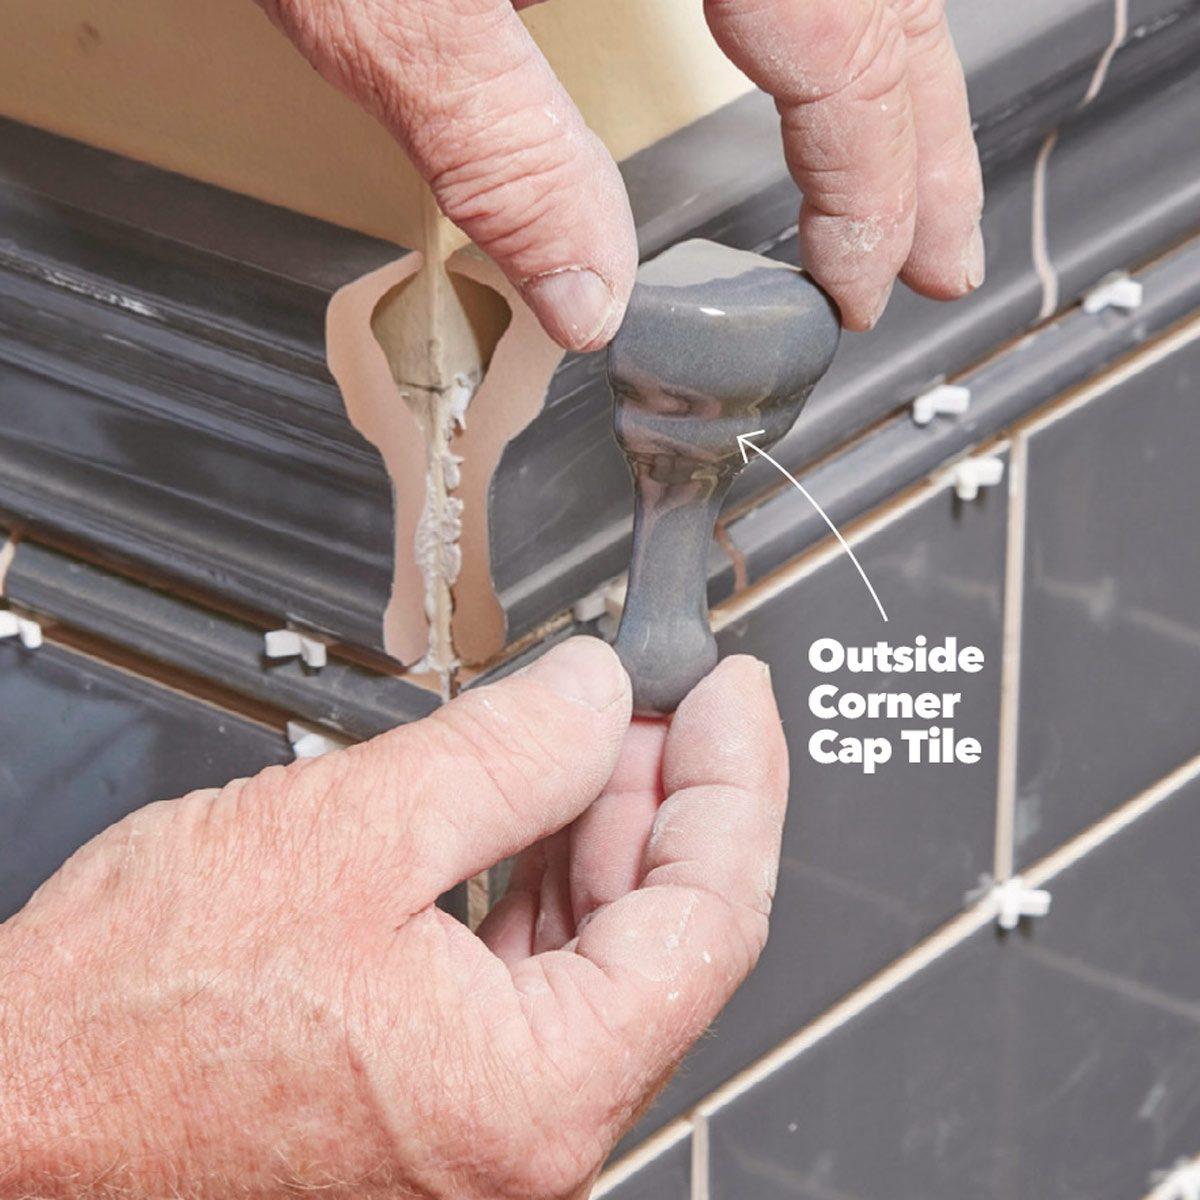 039_FHM_OCTNOV17-1 install corner cap tile